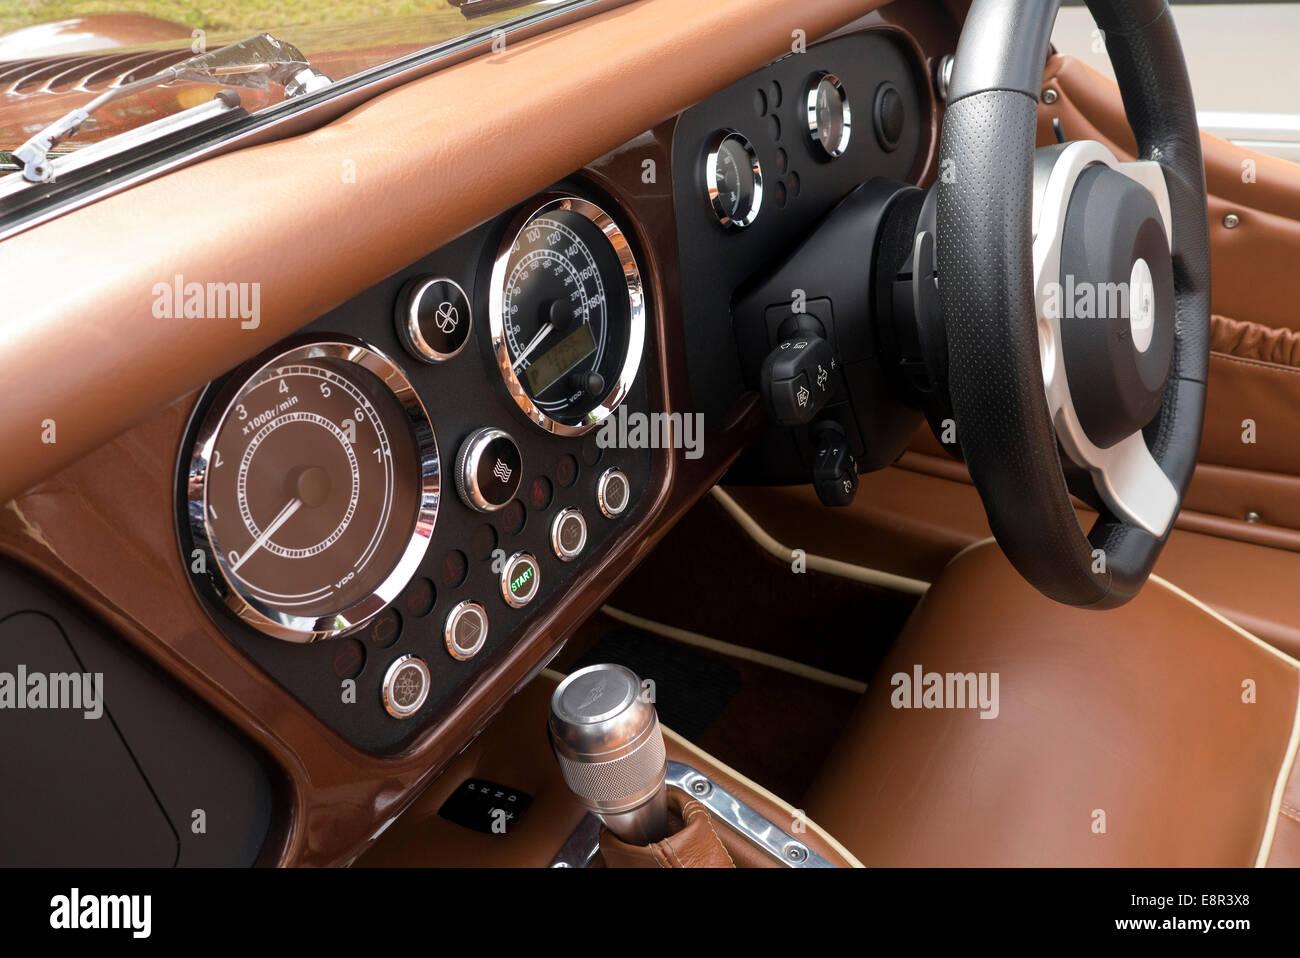 2014 Morgan Plus 8 interior and dashboard - Stock Image